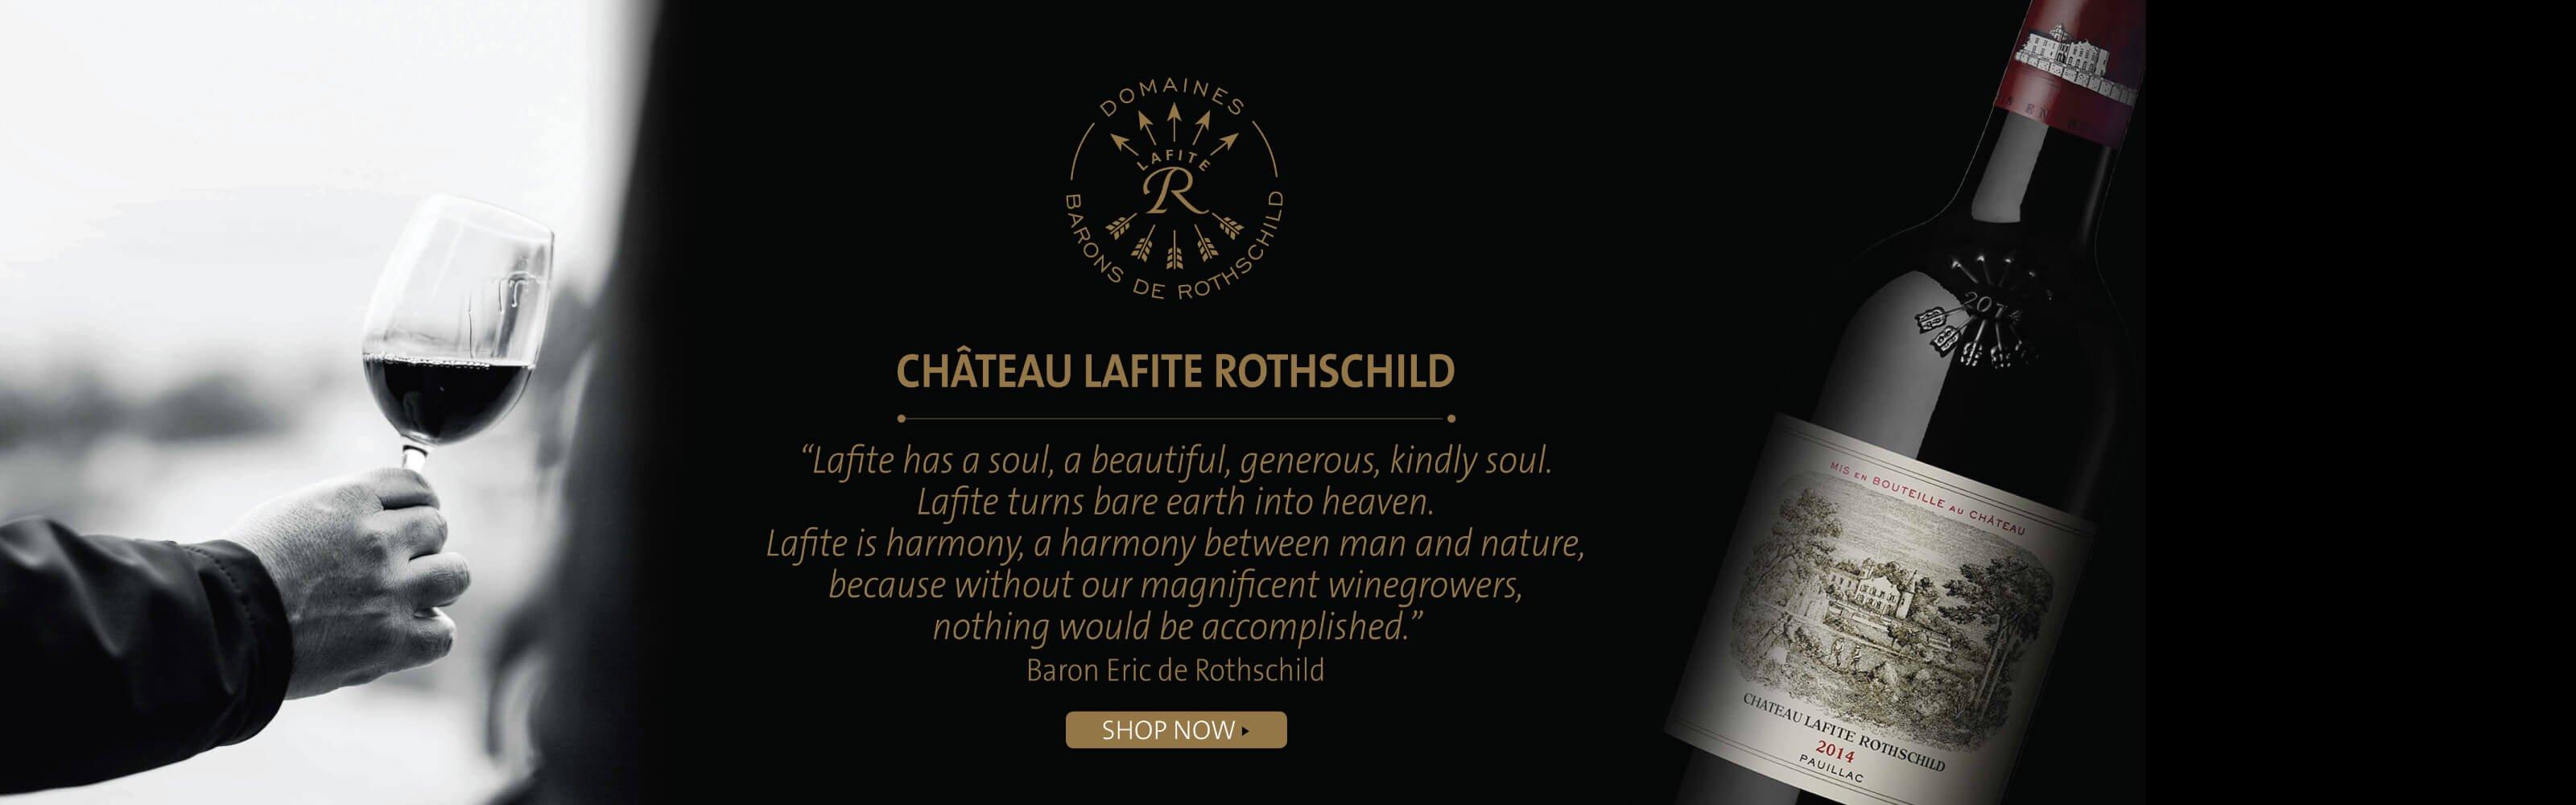 Domaines Barons De Rothschild - Chateau Lafite Rothschild